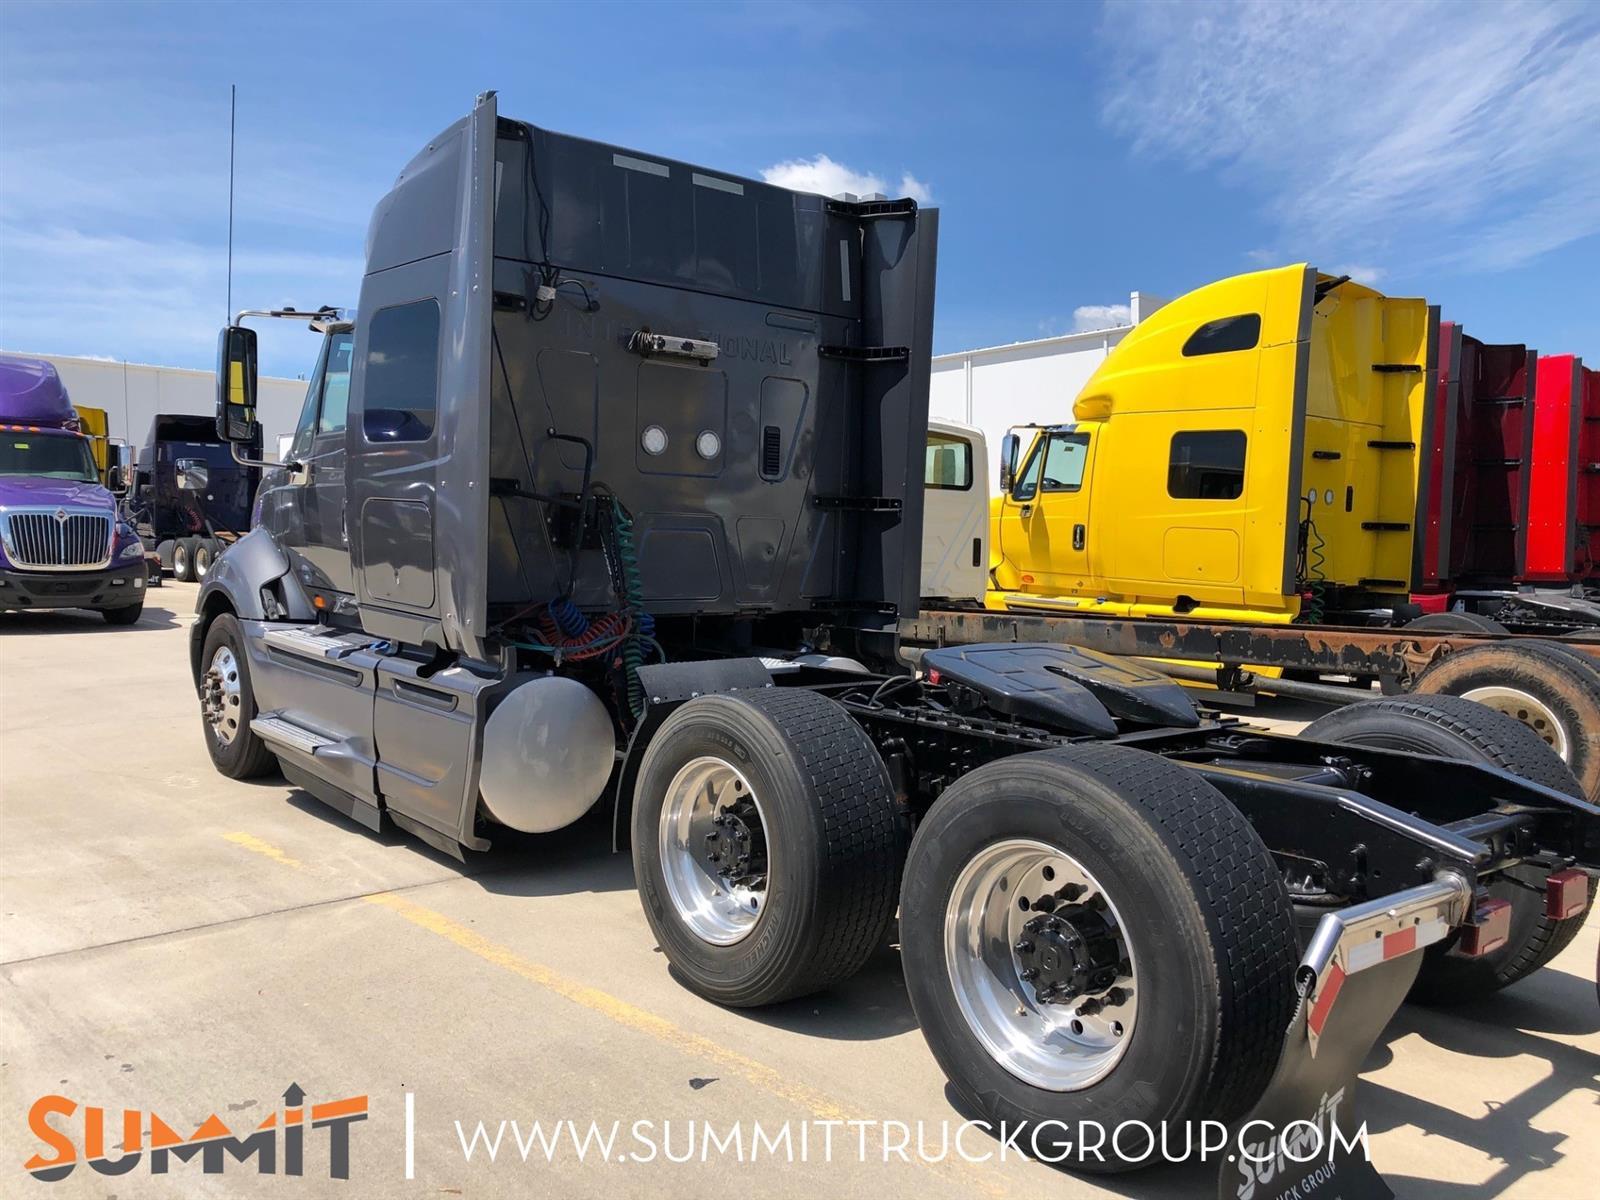 2016 International ProStar+ Sleeper Cab 6x4, Tractor #140F192889 - photo 1